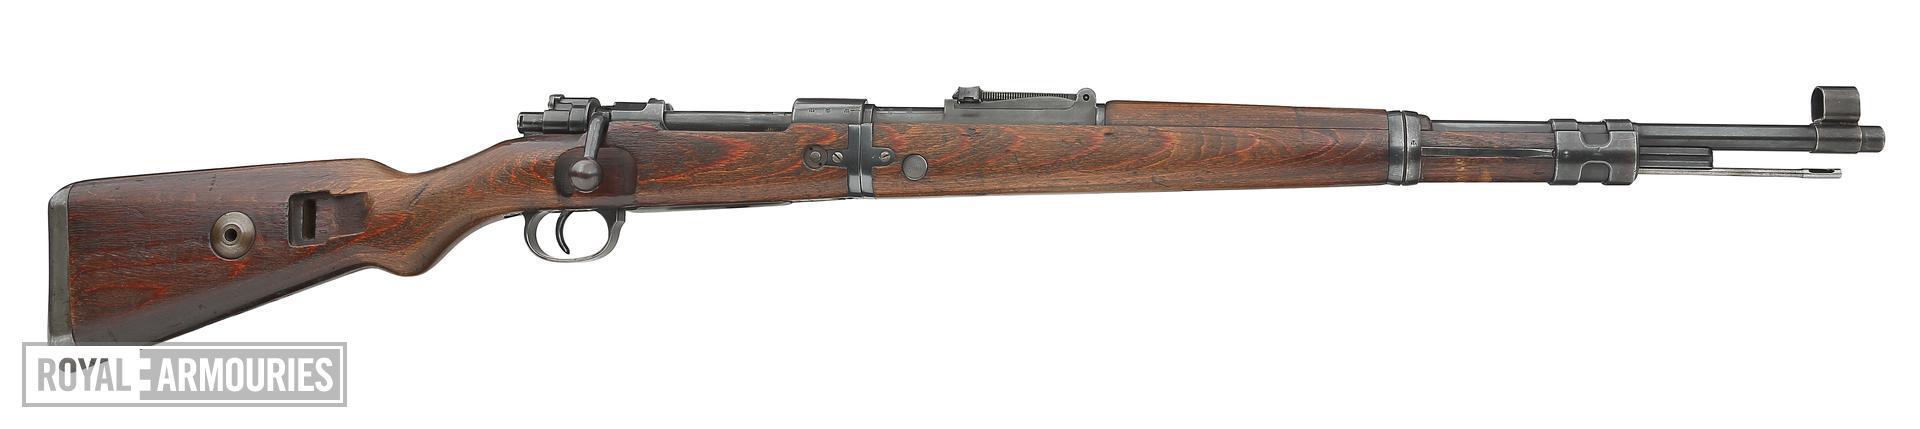 Centrefire bolt-action rifle - Experimental Kar 98k